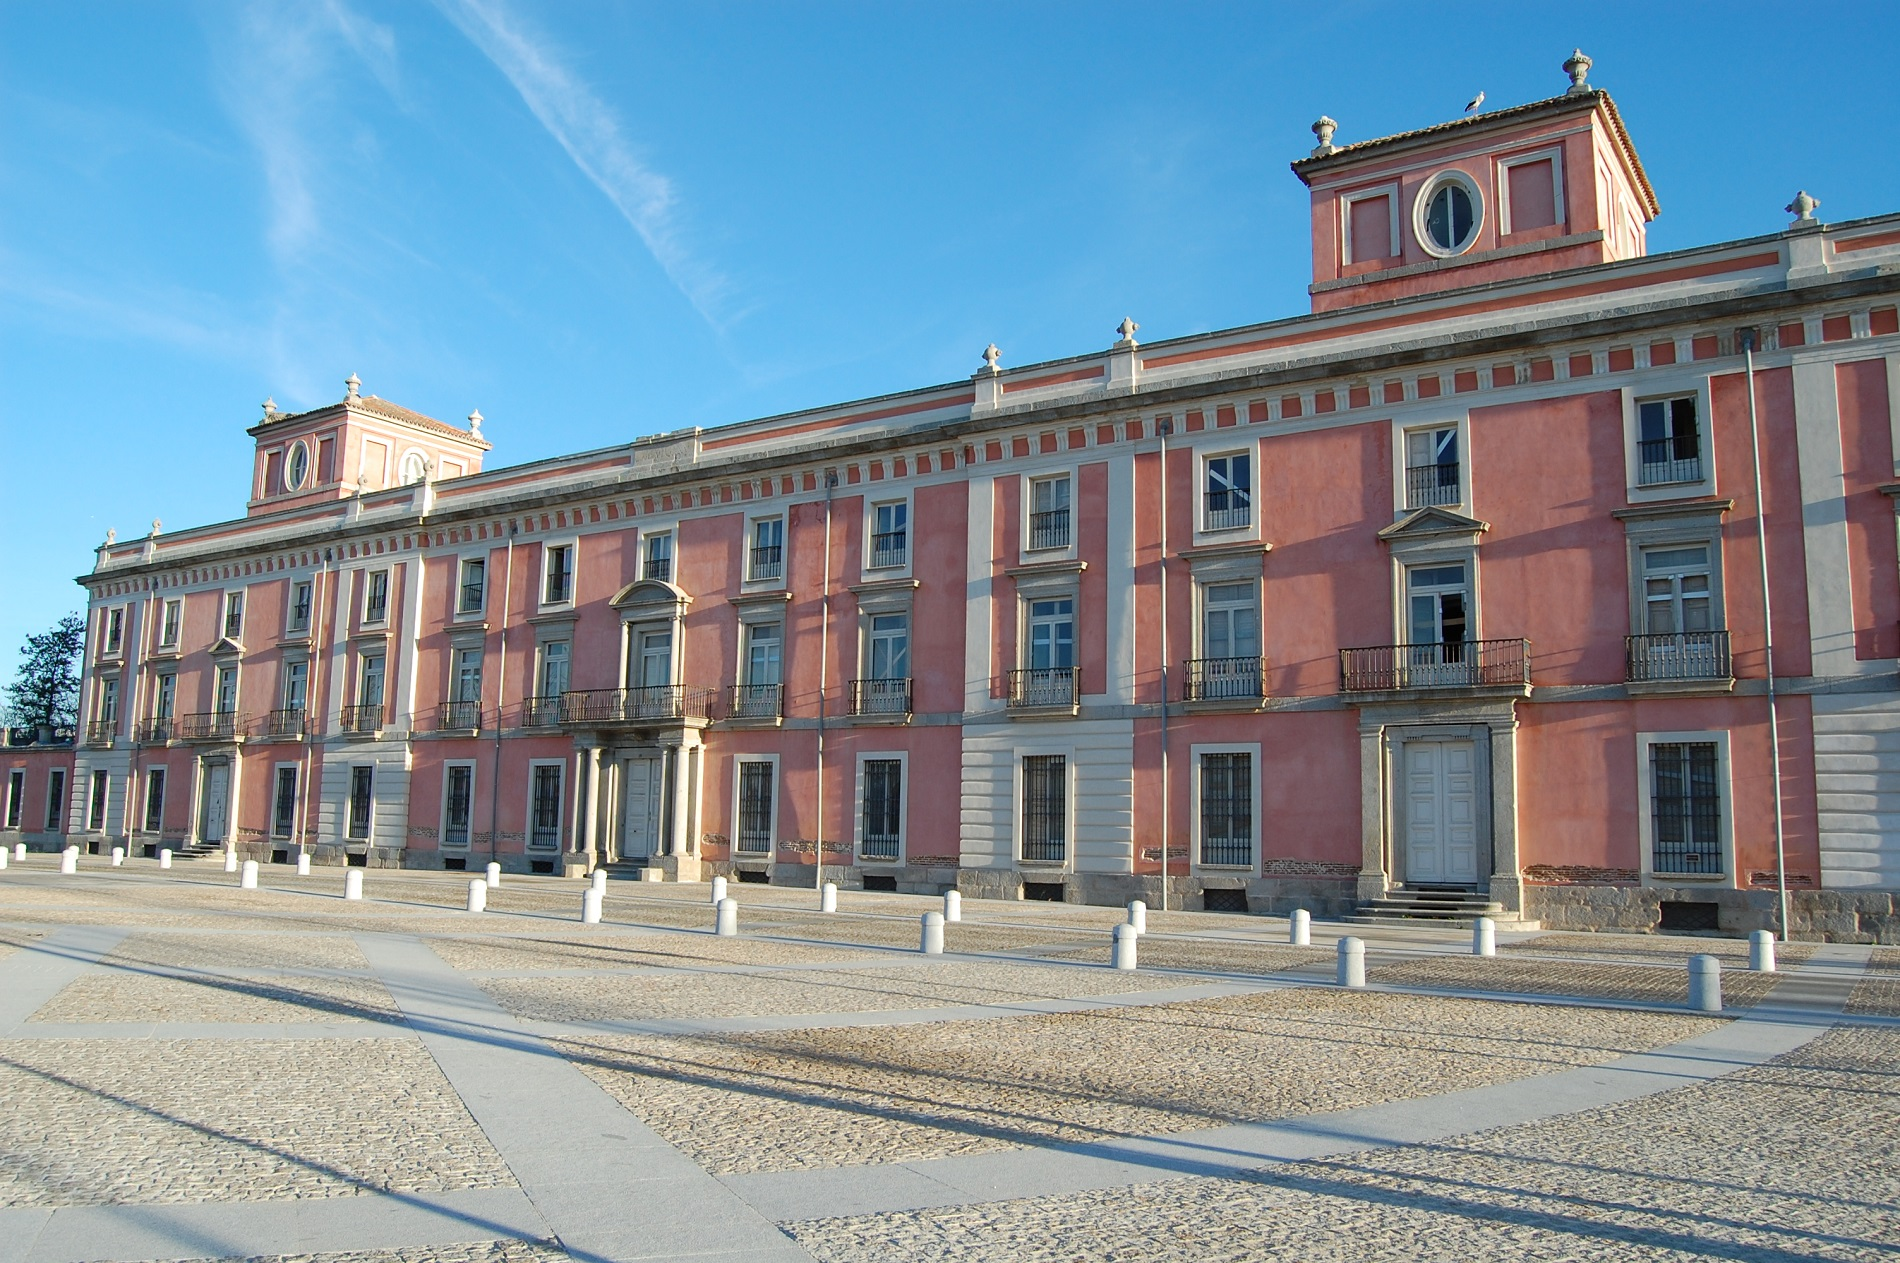 Palacio Infante Don Luis